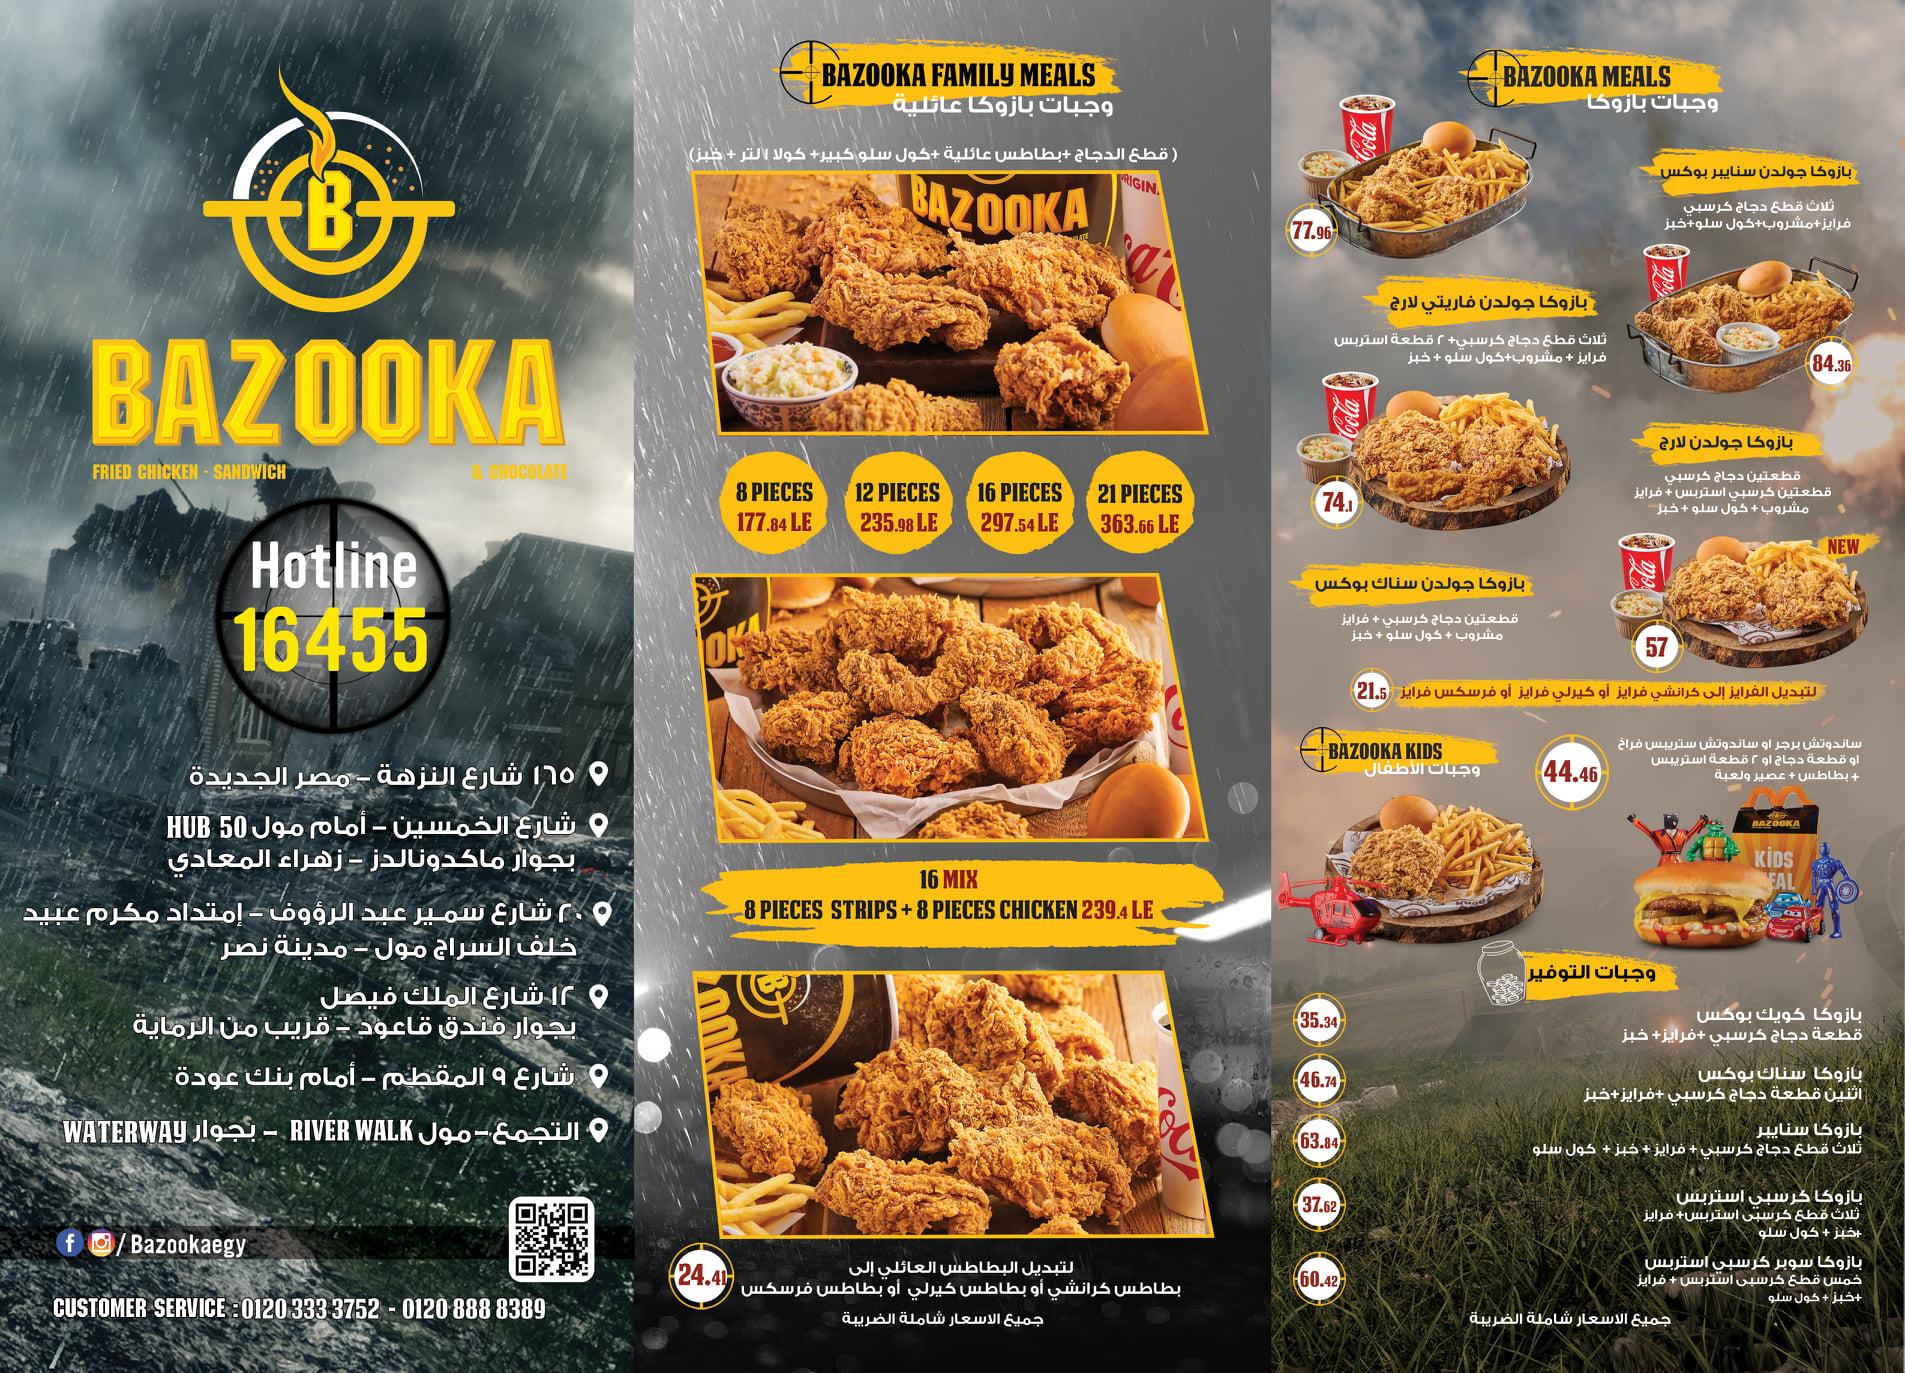 رقم خدمة توصيل مطعم بازوكا Bazooka الخط الساخن مصر 2021